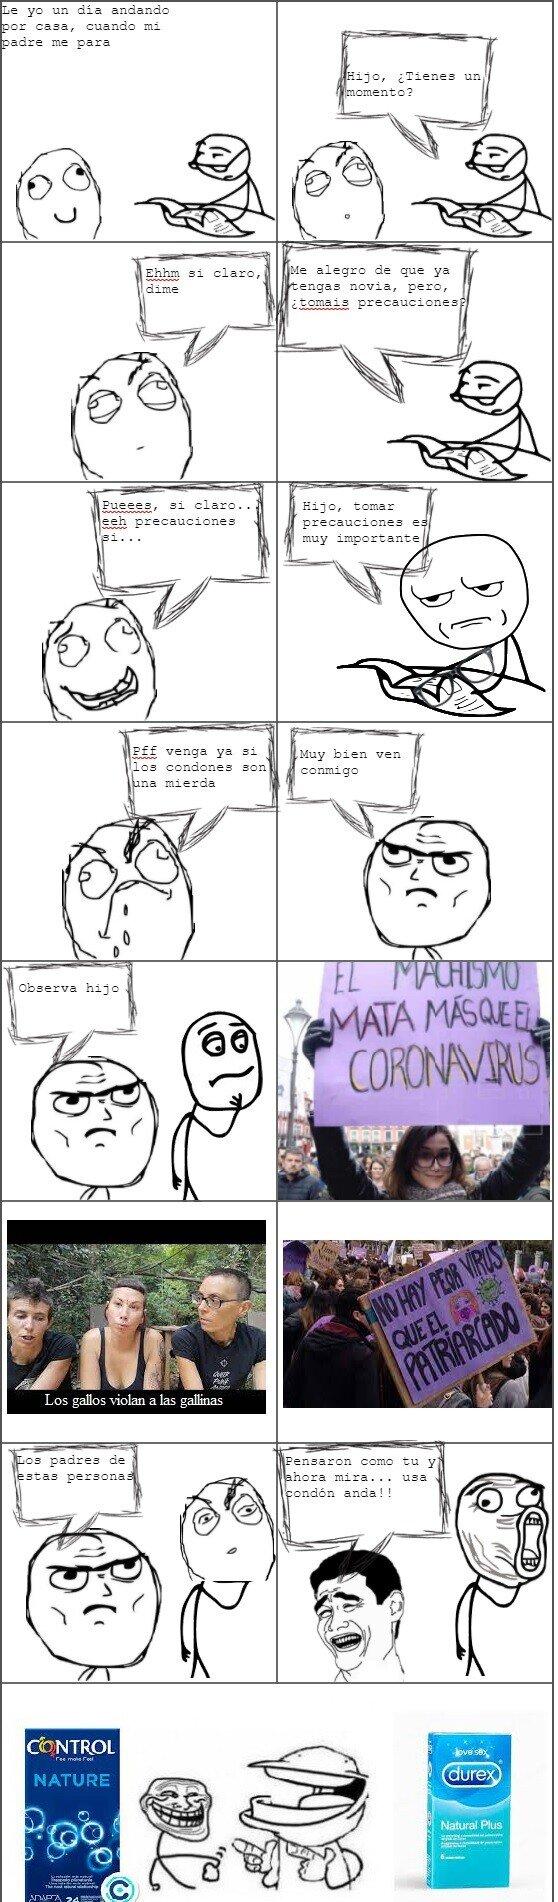 condon,feminismo,lol,troll face,yao ming